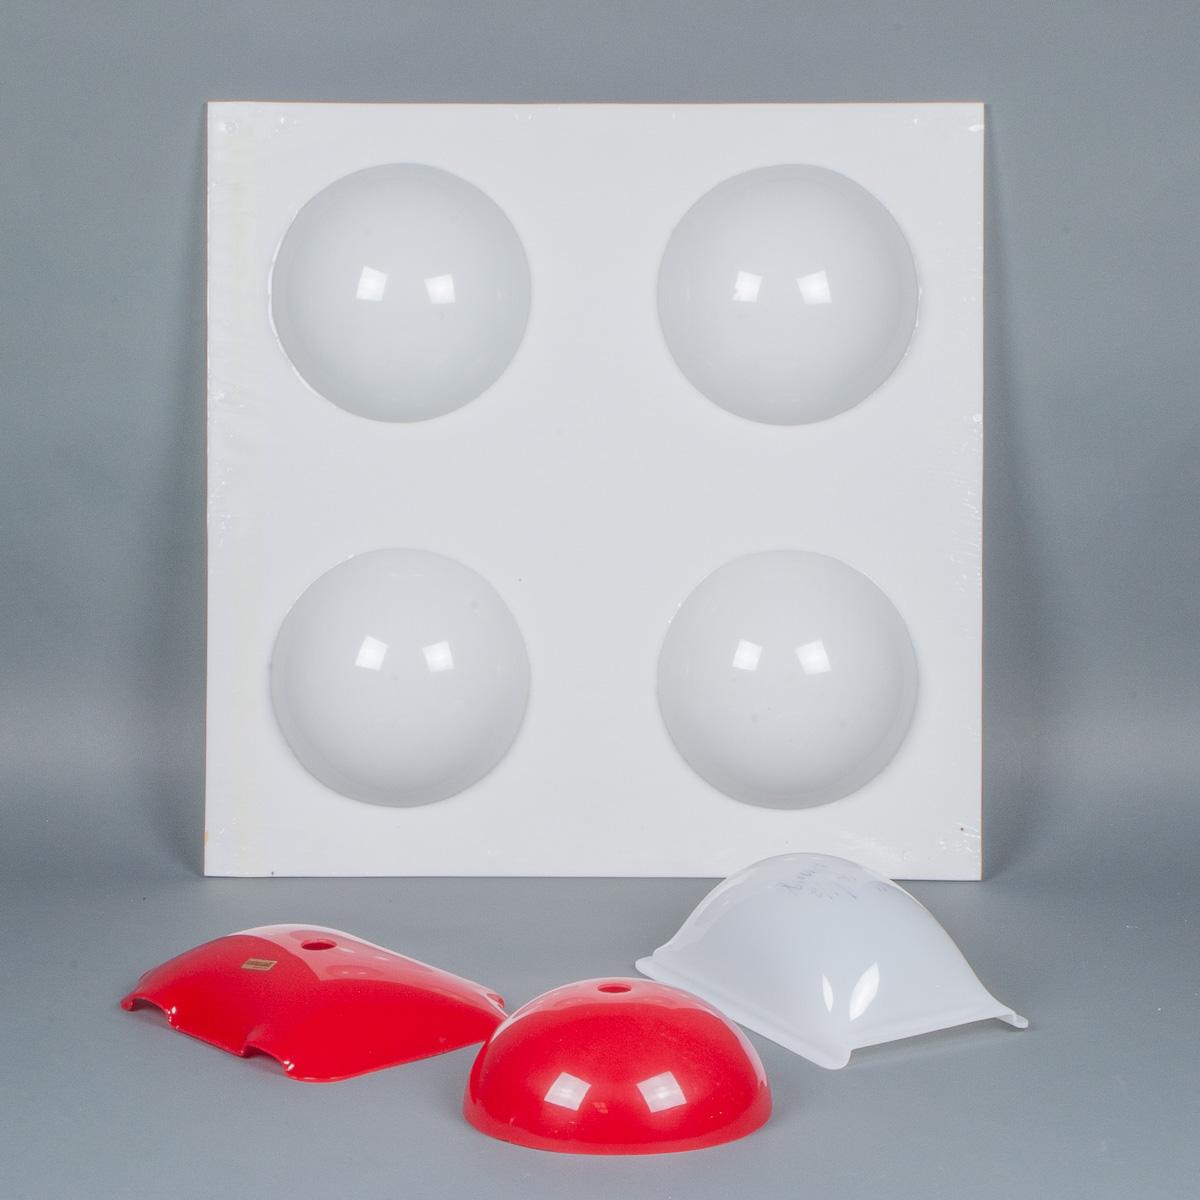 Lustercraft Plastics, Custom Plastics Fabrication